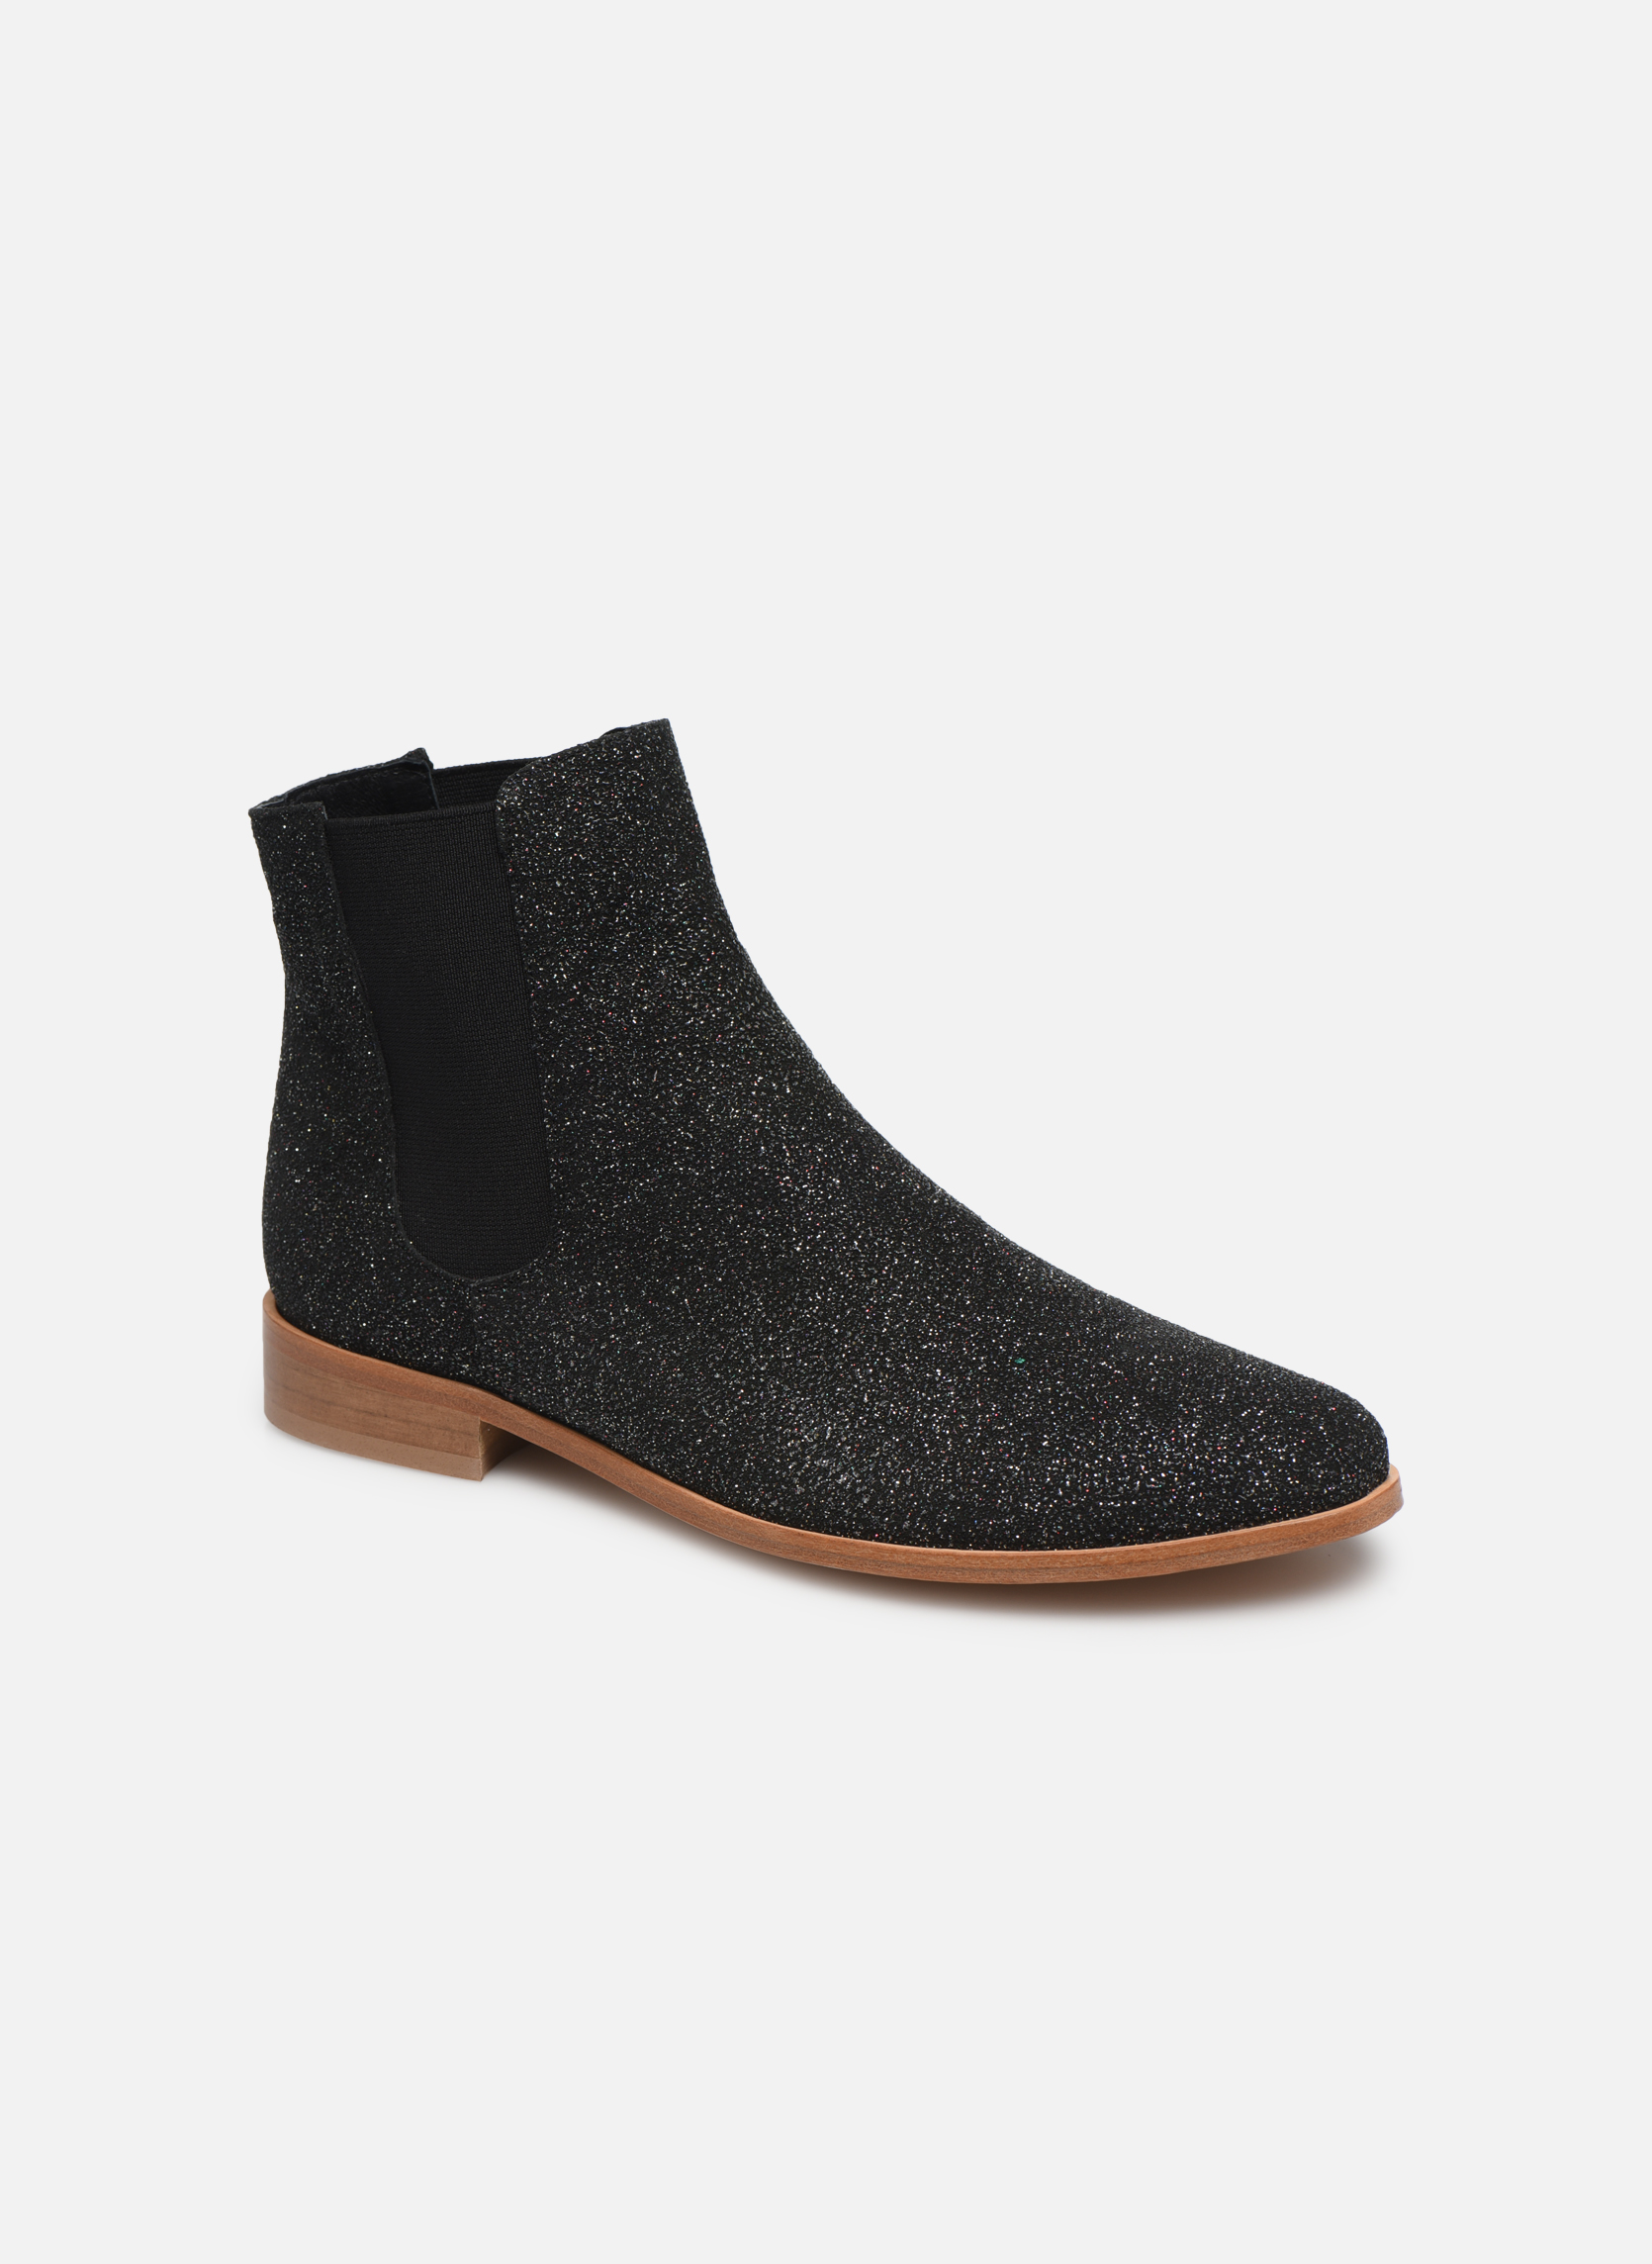 Bottines et boots Femme Frida